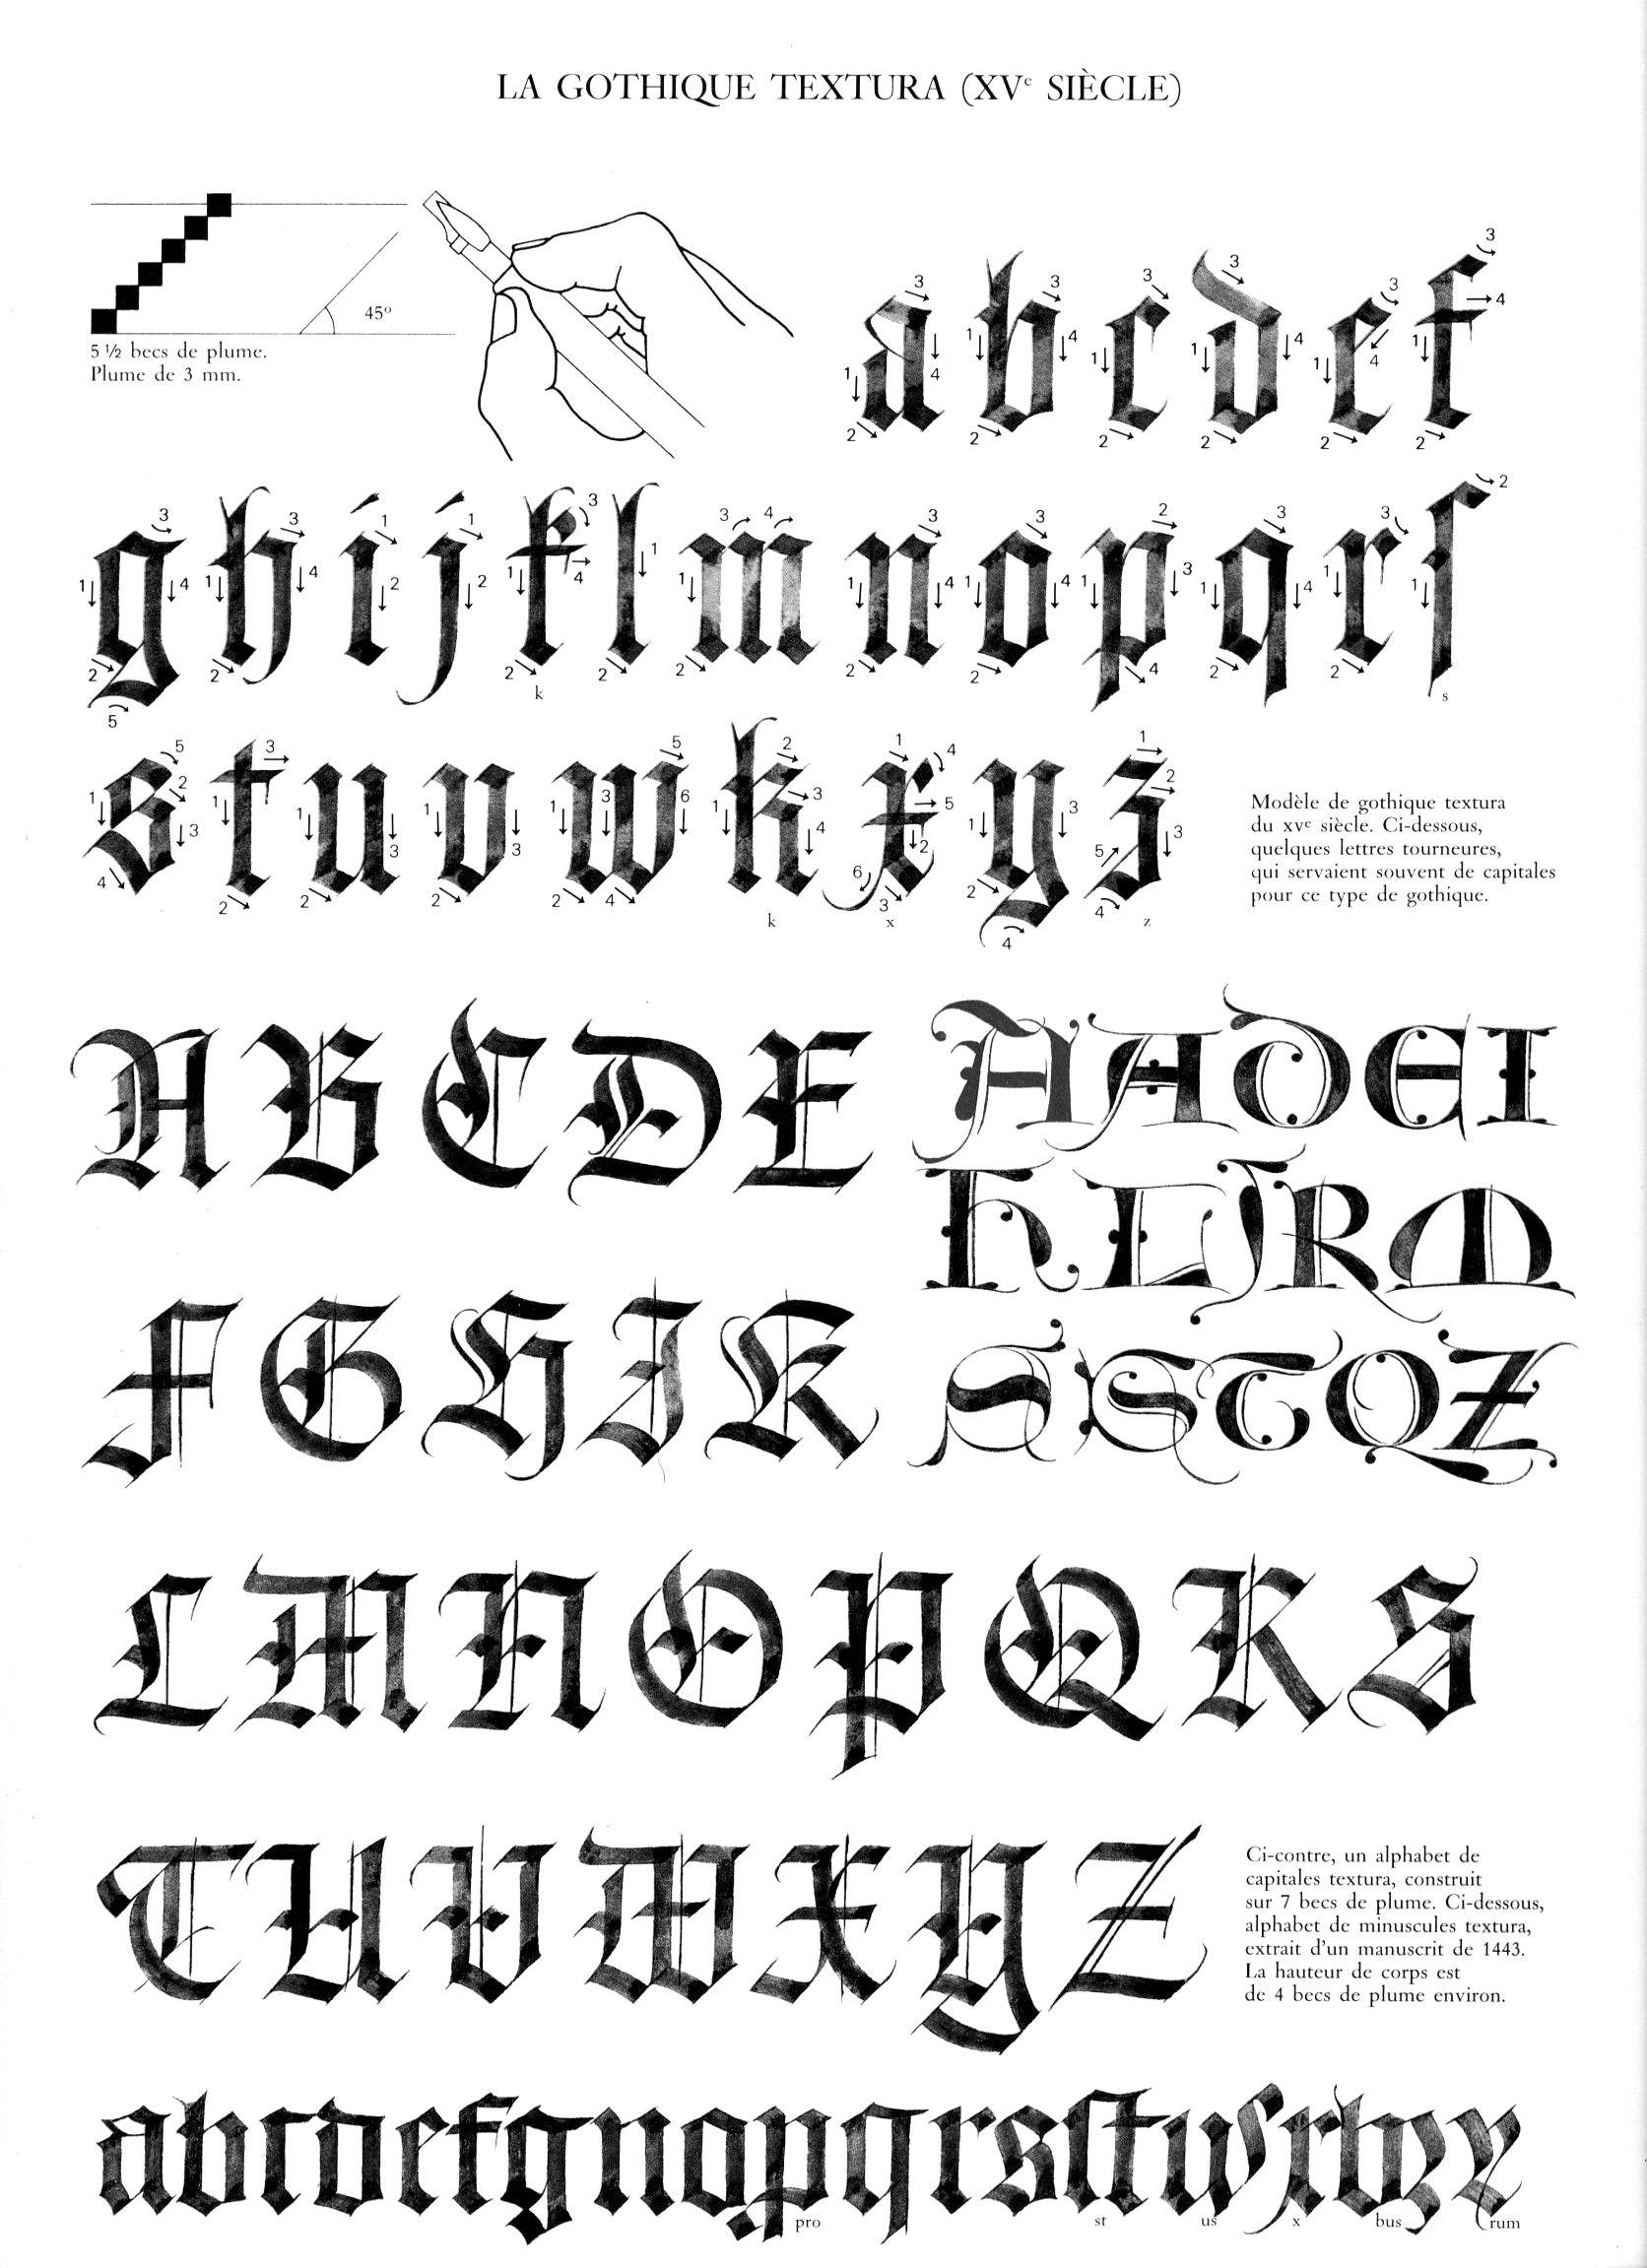 Gothic textura alphabet calligraphy pinterest g tico Pinterest calligraphy